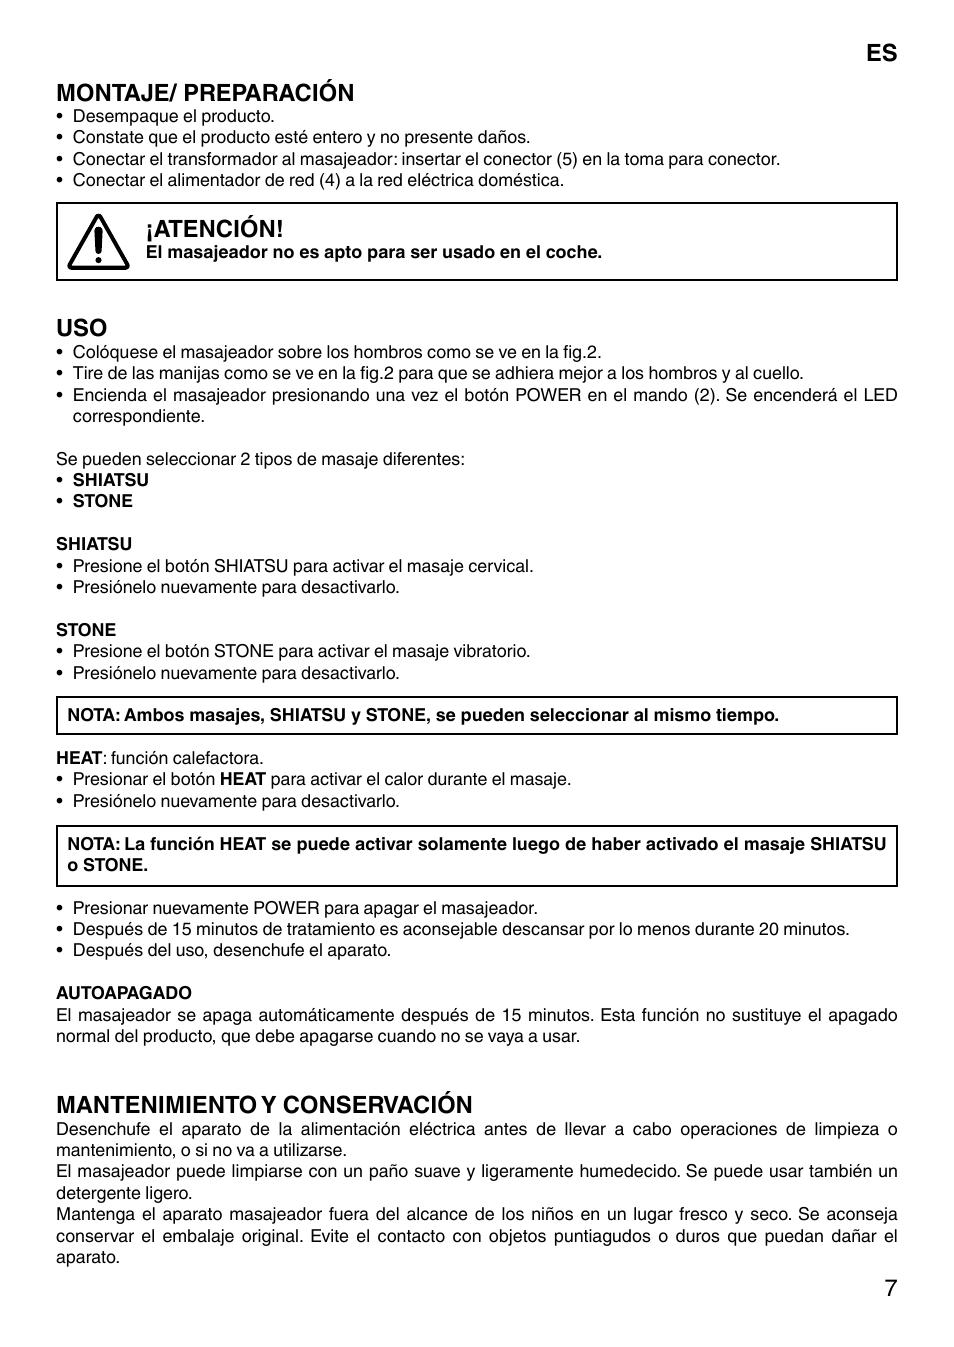 Imetec Sensuij Mc1 200.7montaje Preparacion Atencion Mantenimiento Y Conservacion